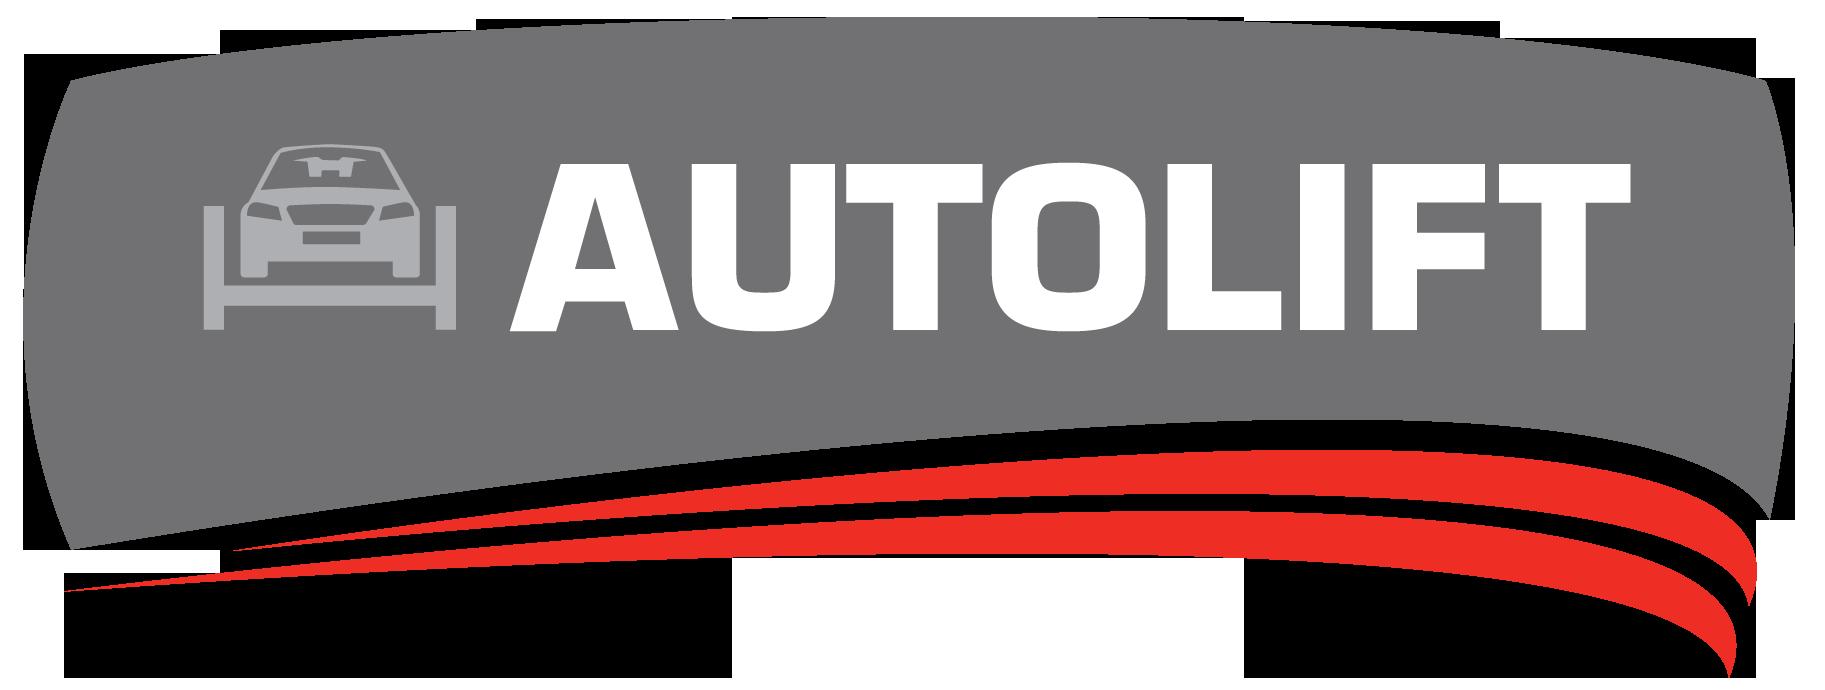 Autolift AS Trondheim